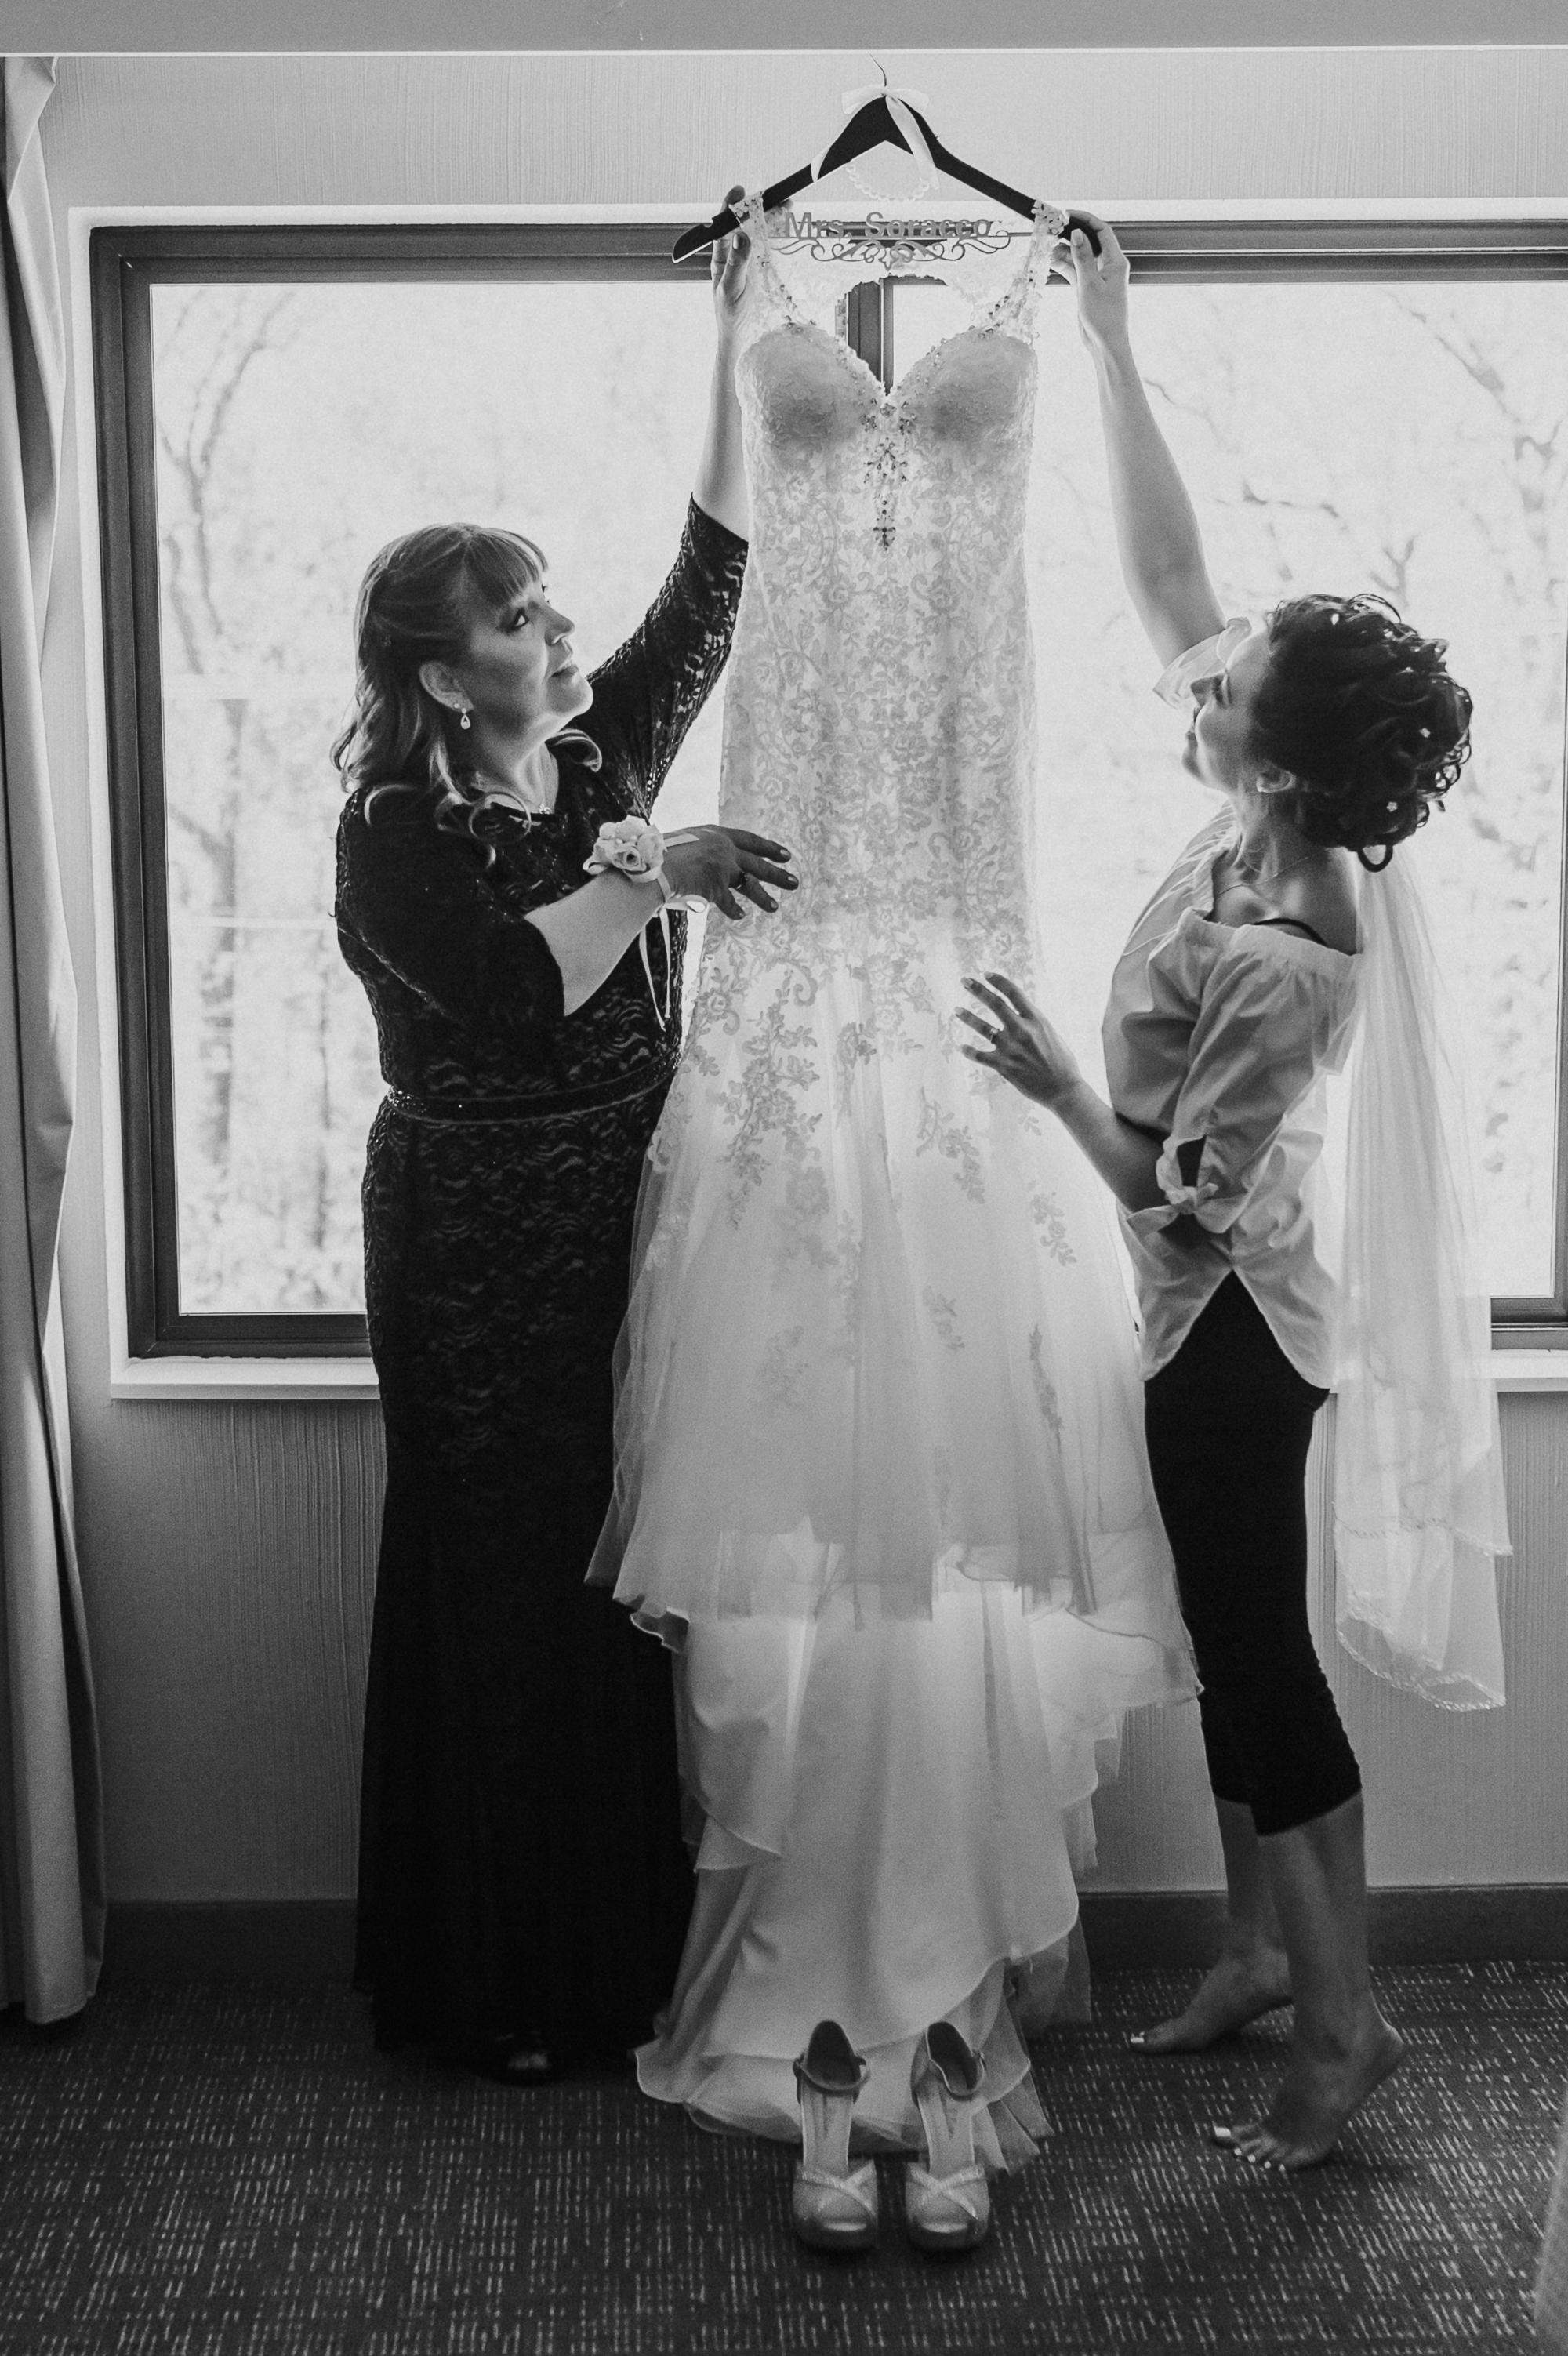 Christina-and-Gene-Wedding-Marla-Rain-Photography-65.jpg